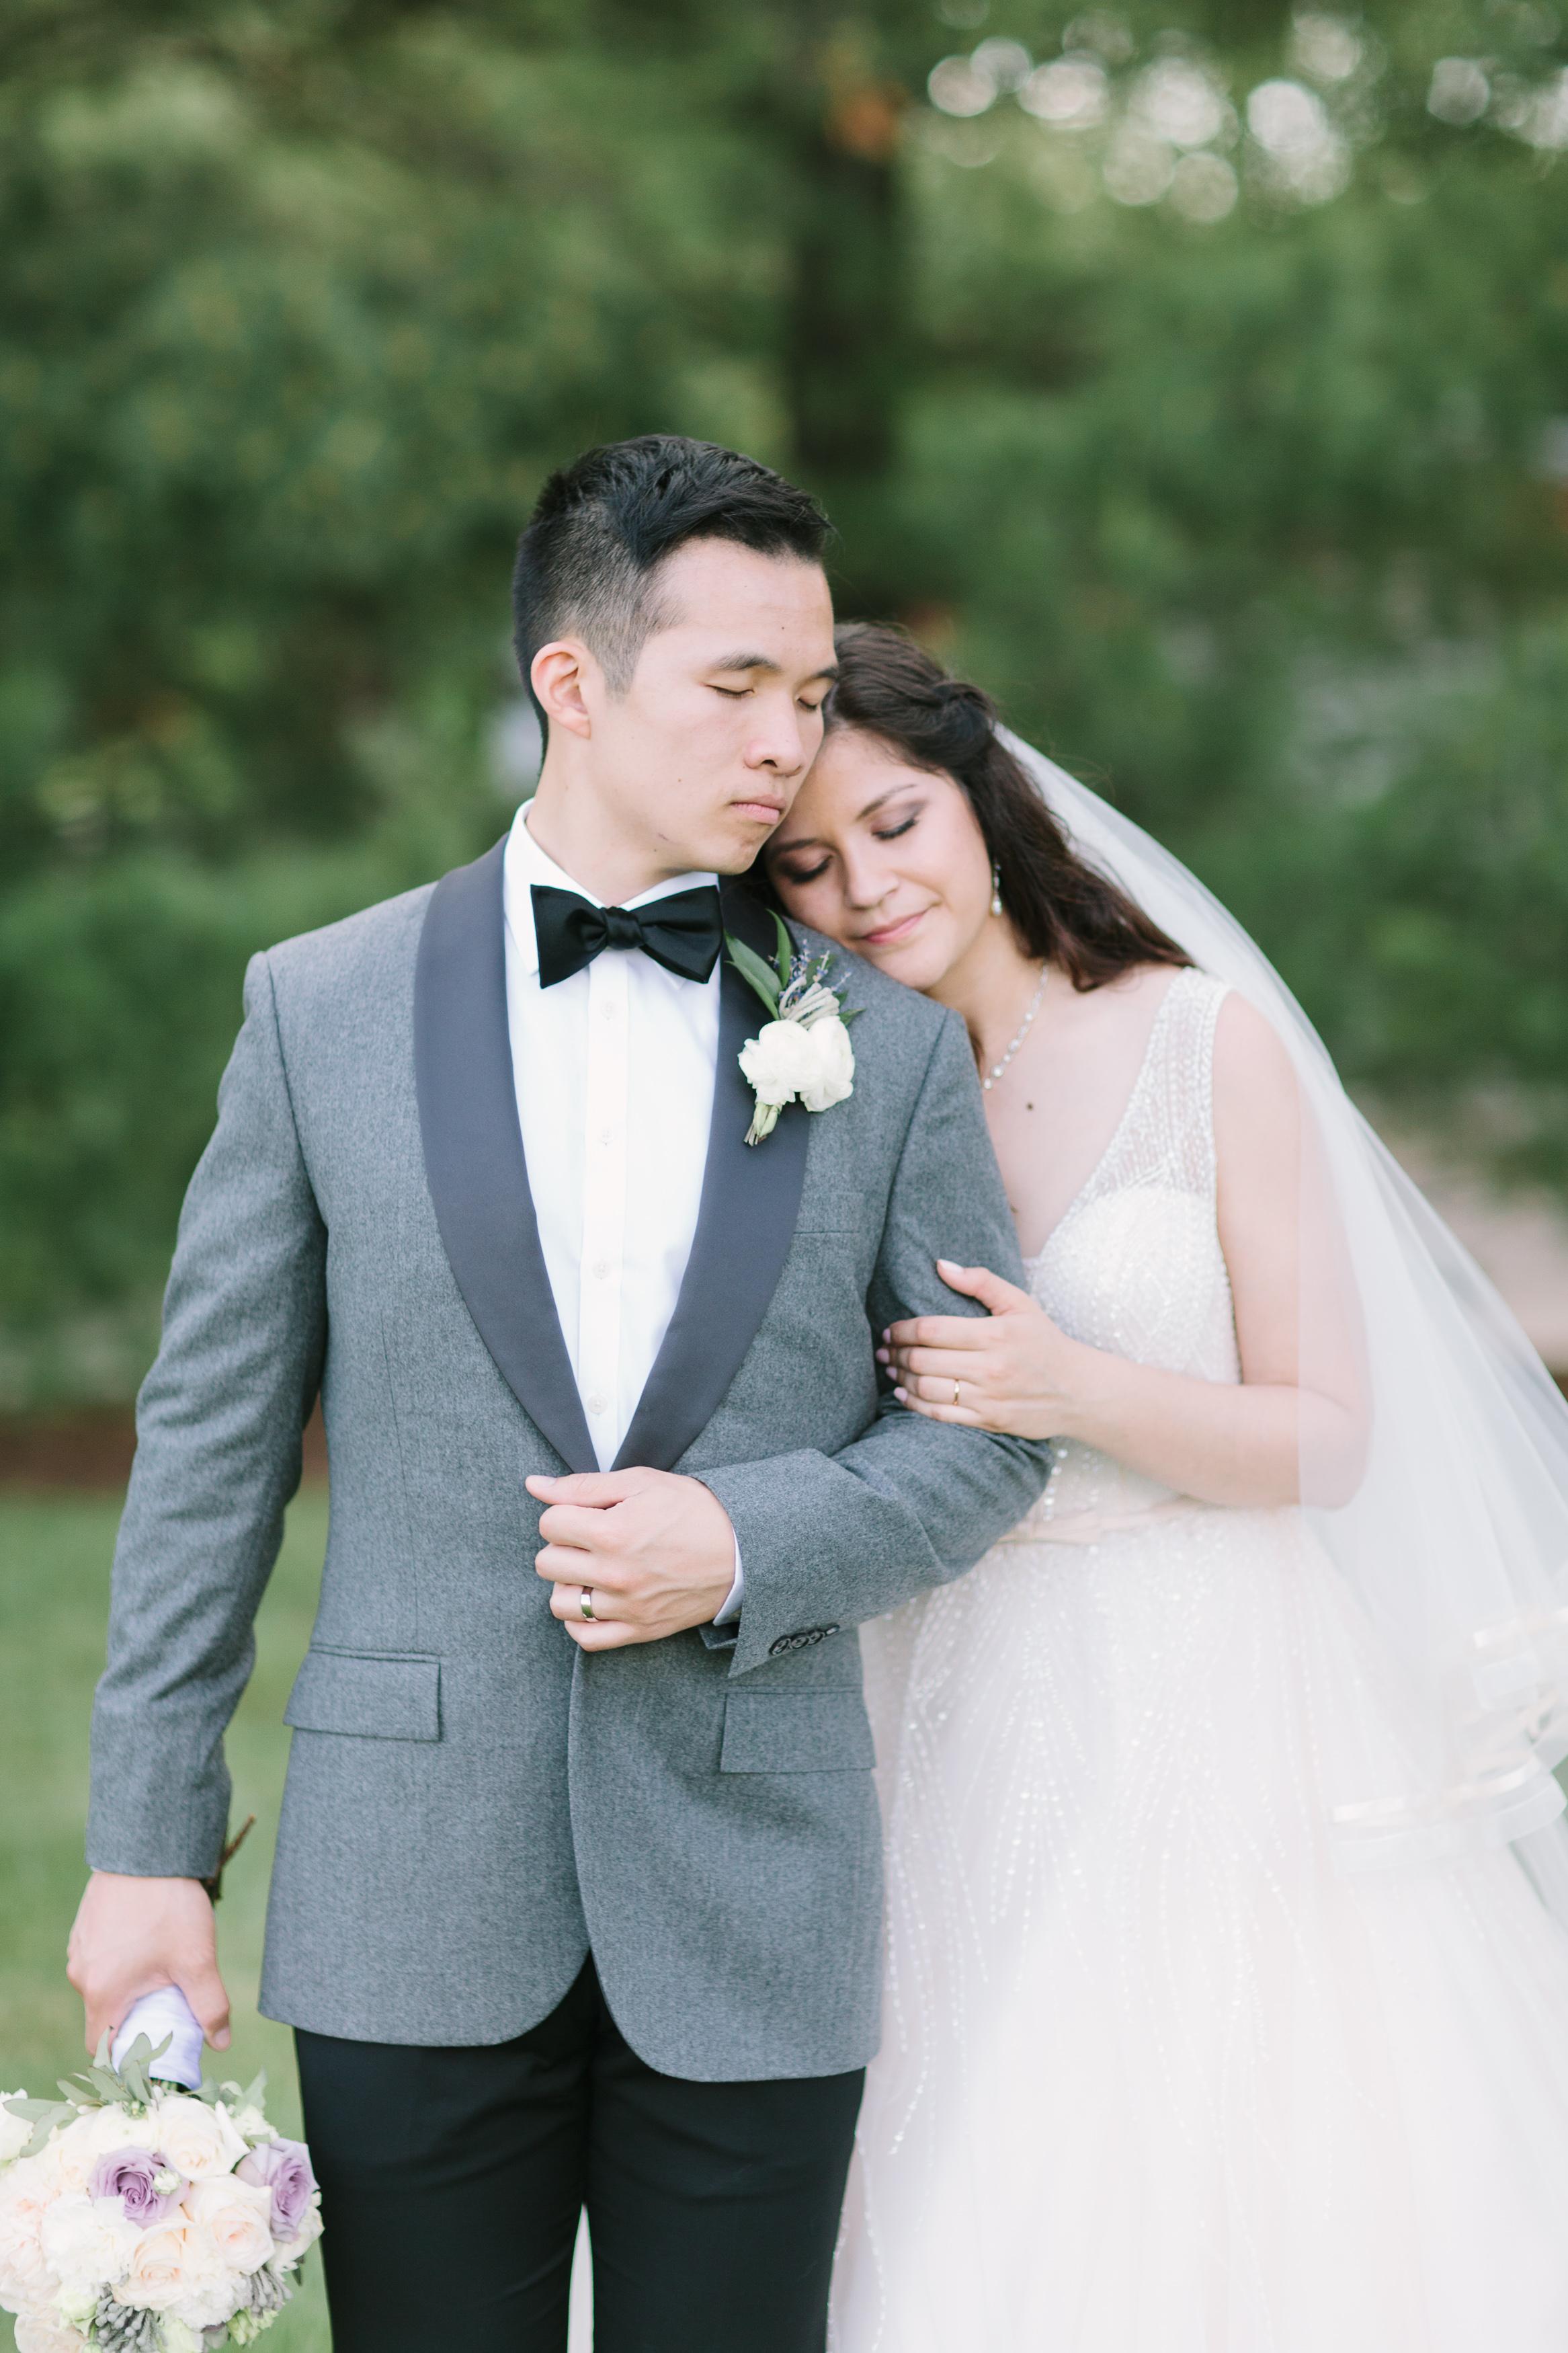 Nicodem Creative_Blog_Leung Wedding_The Pavilion at Orchad Ridge Farms_Rockton Illinois-54.jpg